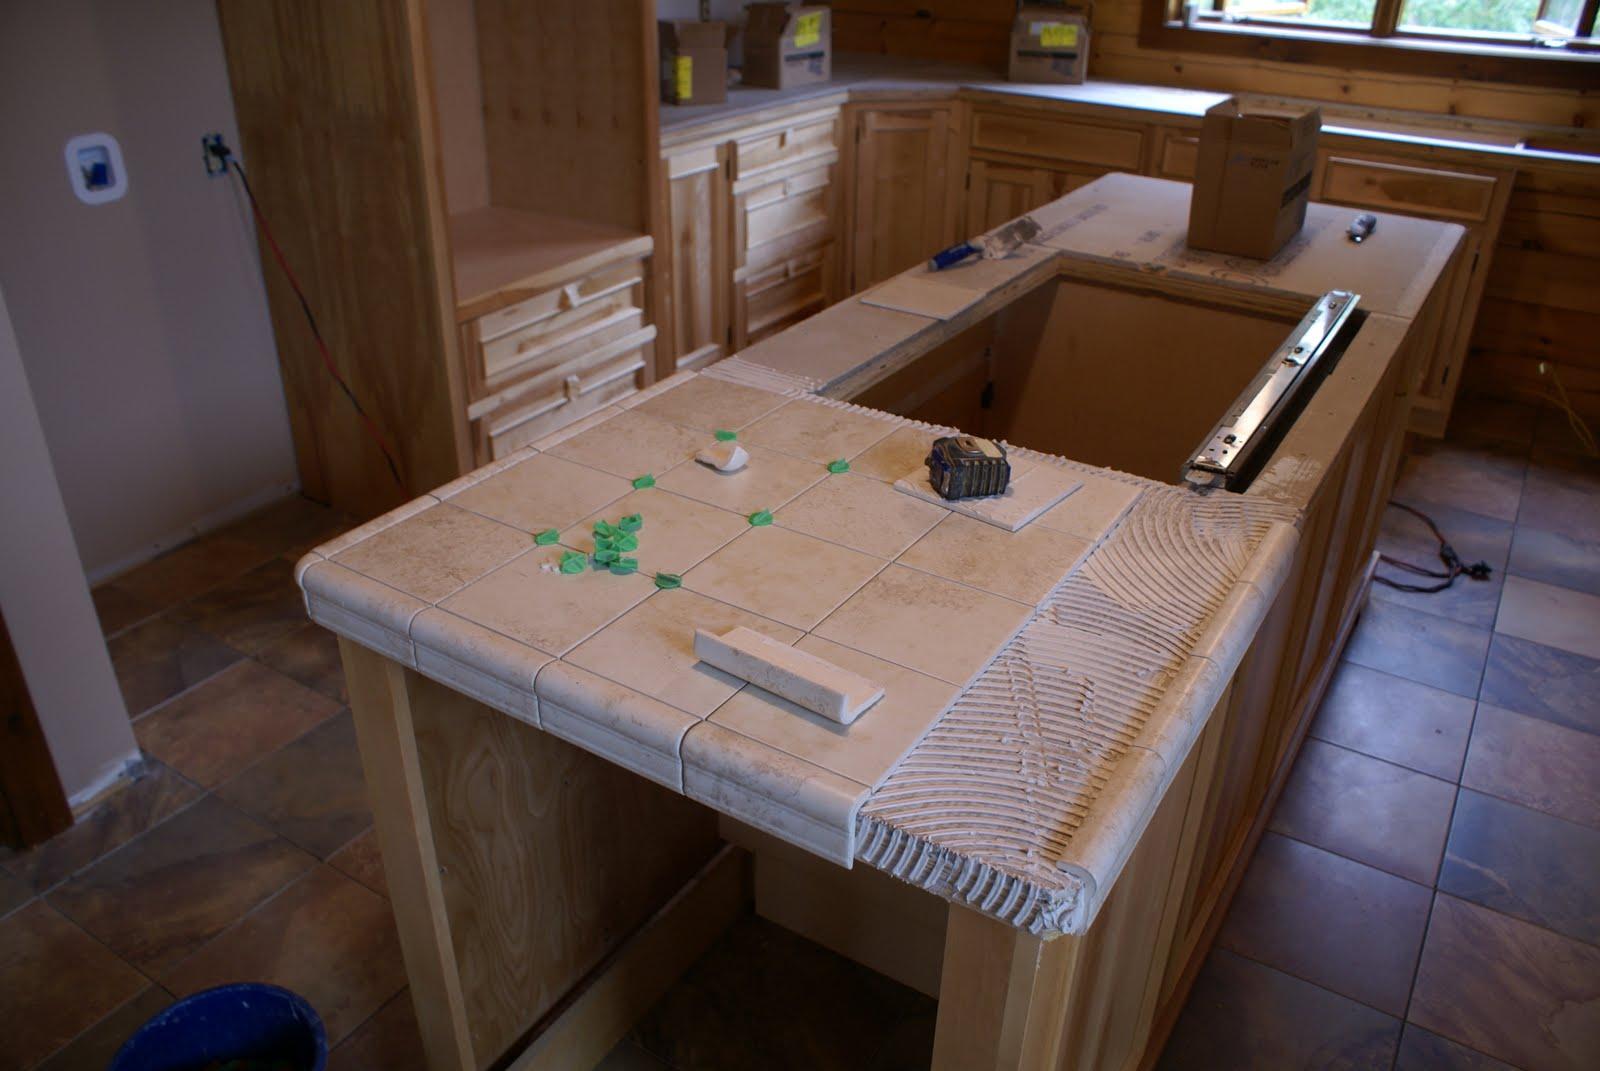 kitchen counter tile digital timer hidden bend retreat romney west virginia